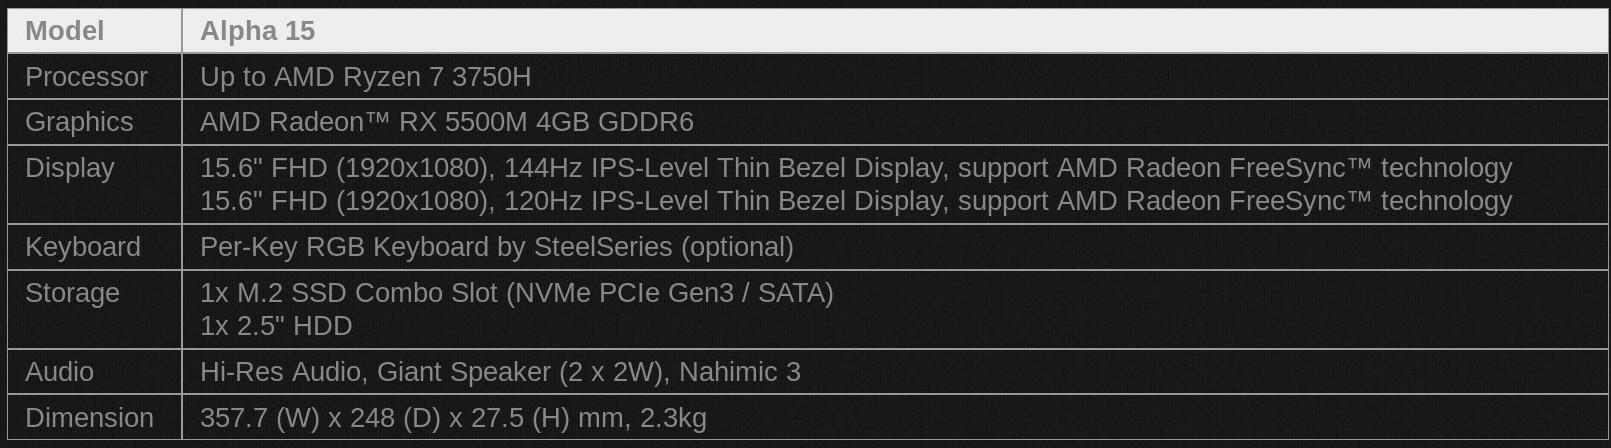 msi 7nm laptop specs